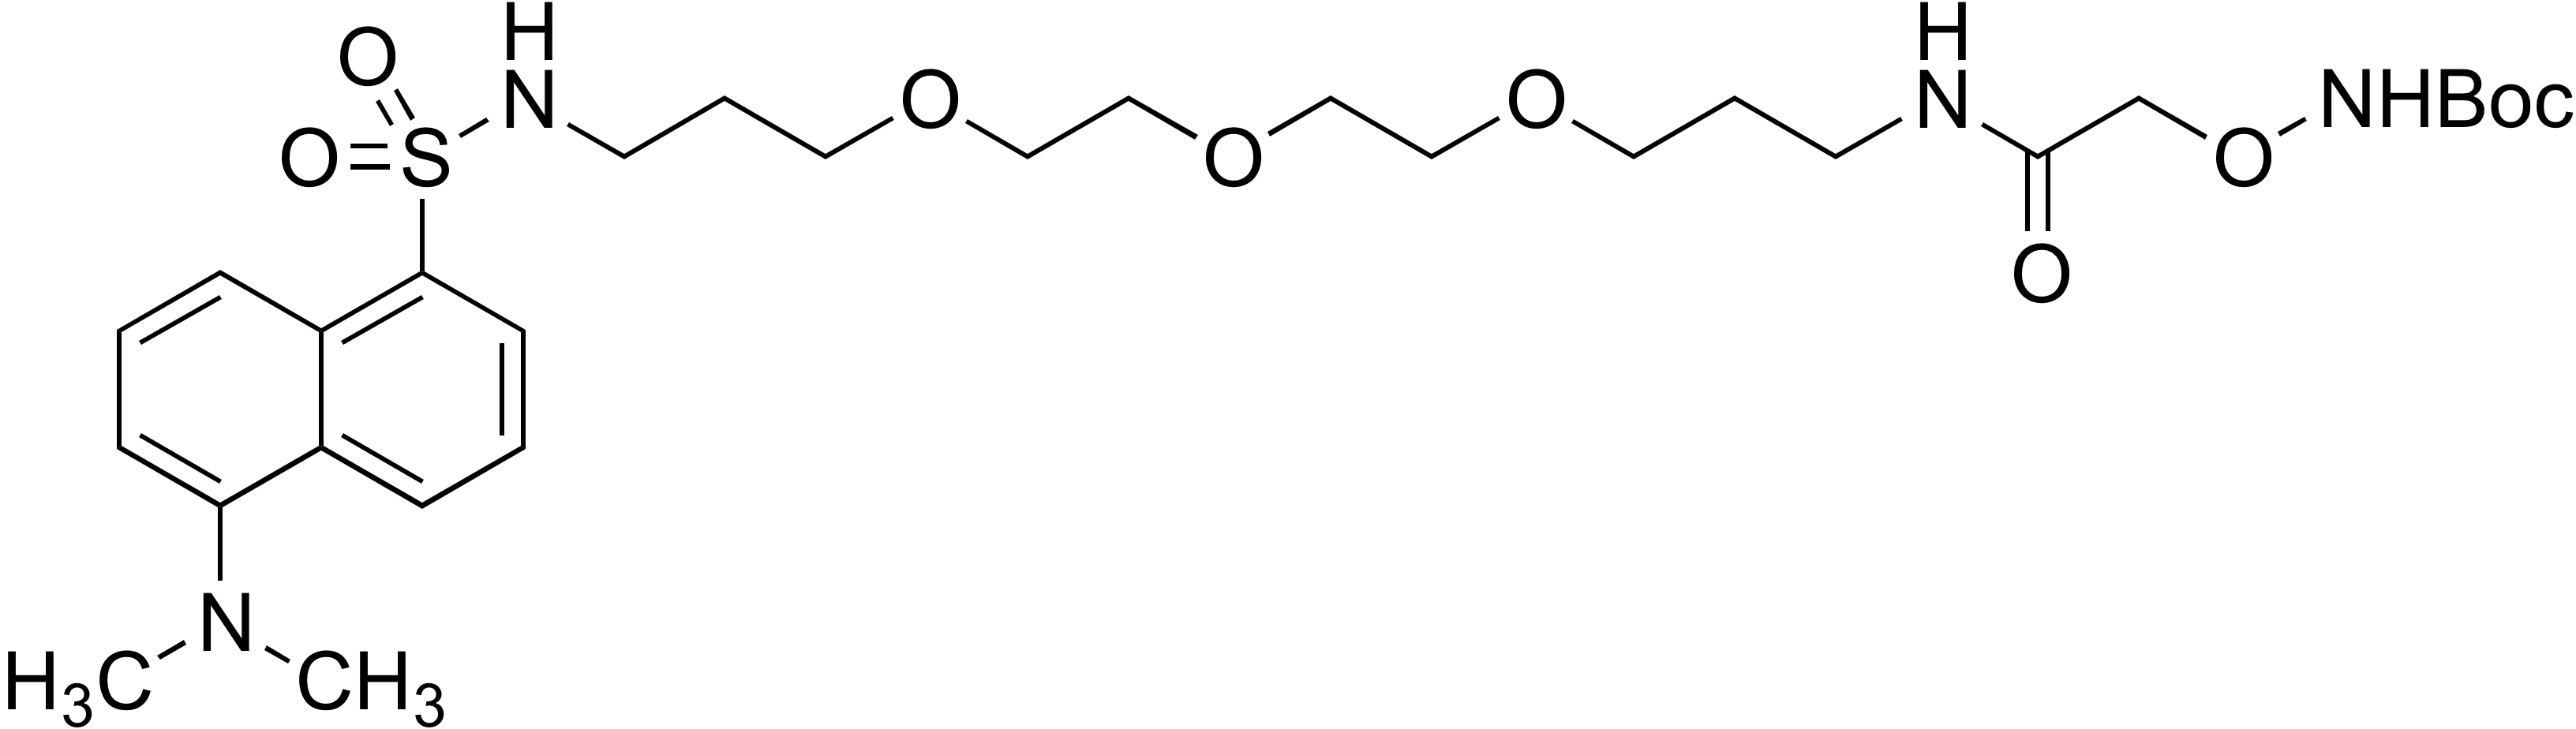 tert-Butyl 16-(5-(dimethylamino)naphthalene-1-sulfonamido)-2-oxo-7,10,13-trioxa-3-azahexadecyloxycarbamate